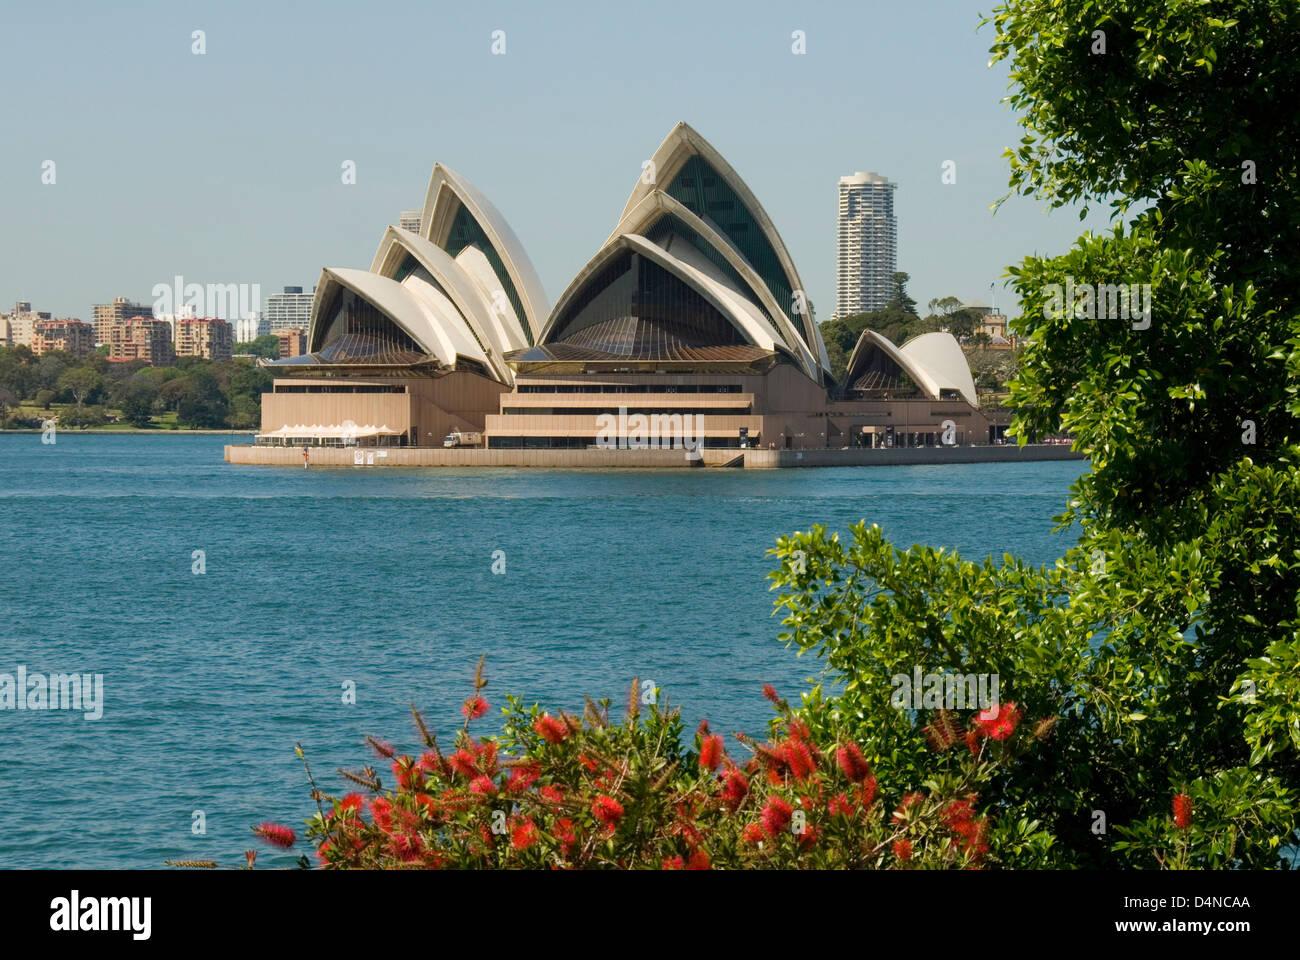 Sydney Opera House from Kirribilli, Sydney, New South Wales, Australia - Stock Image